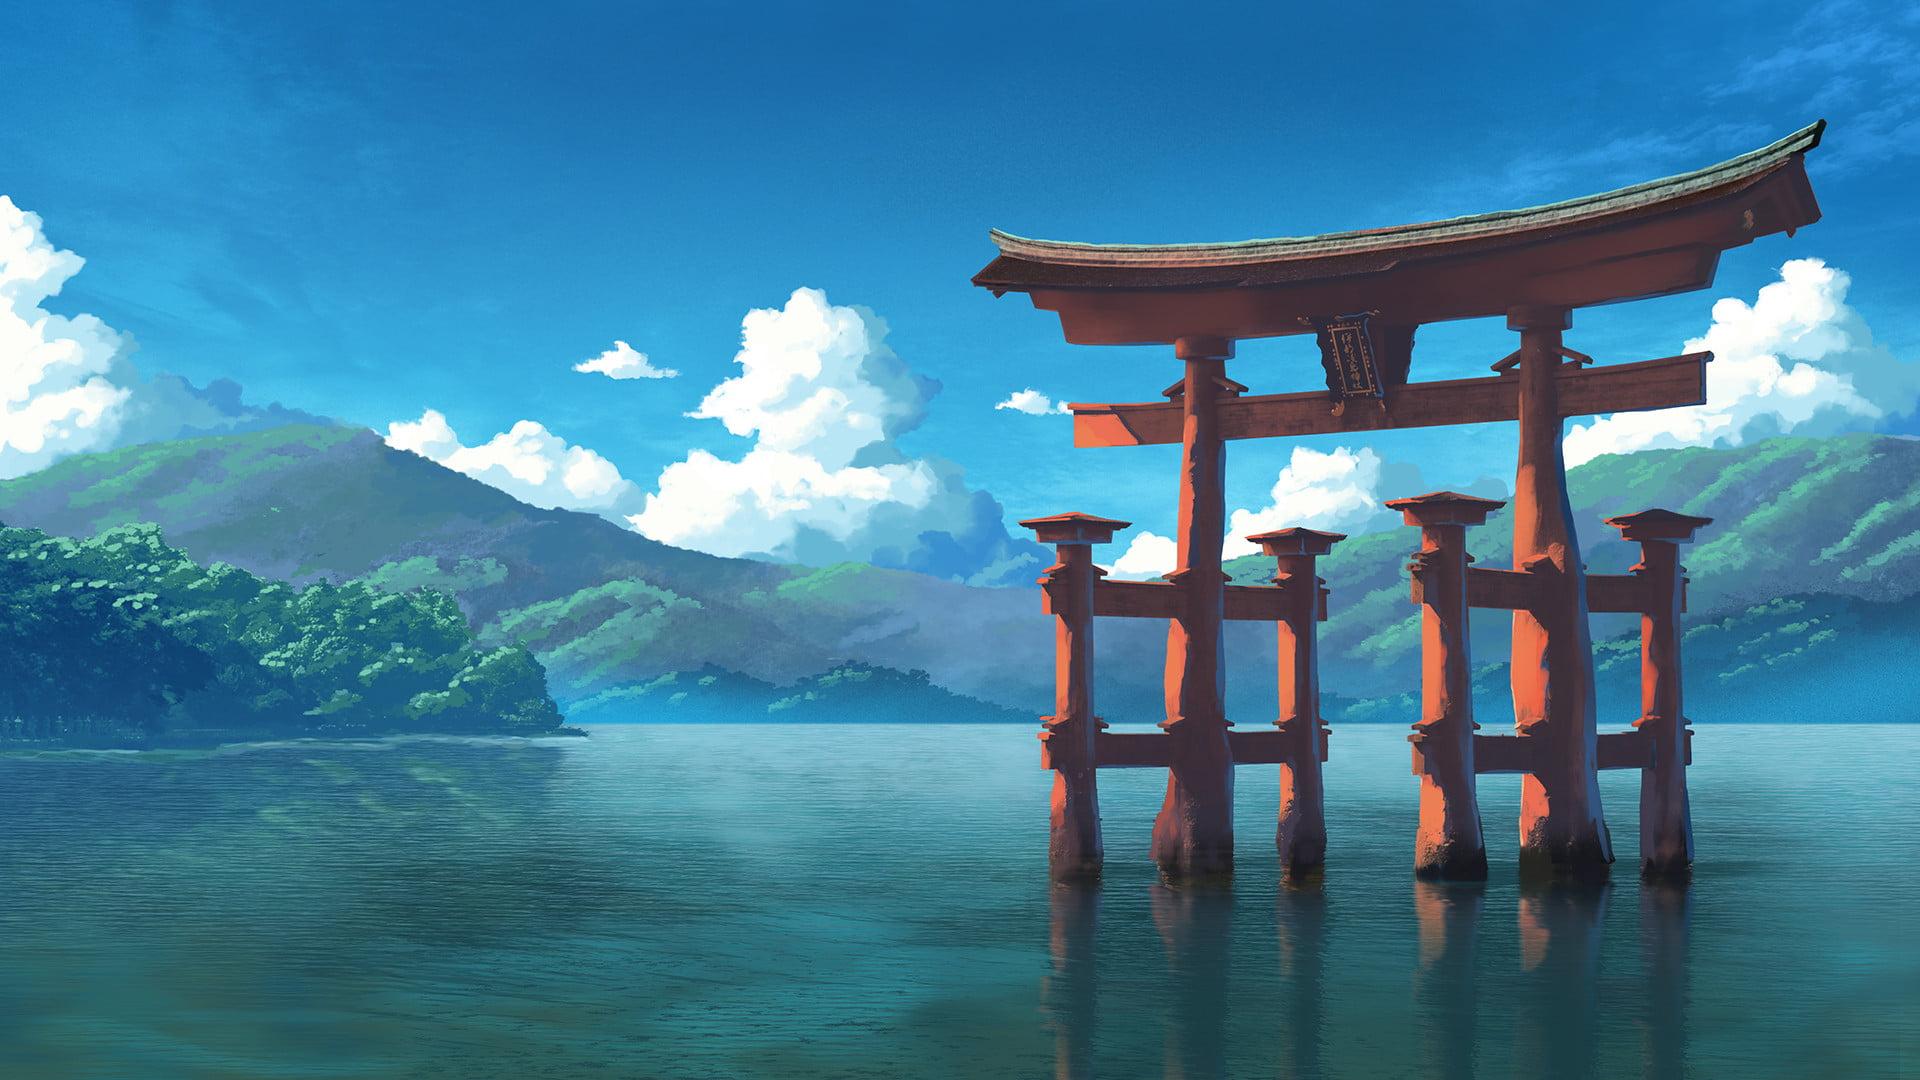 Tori gate digital wallpaper shrine water mountains clouds HD 1920x1080